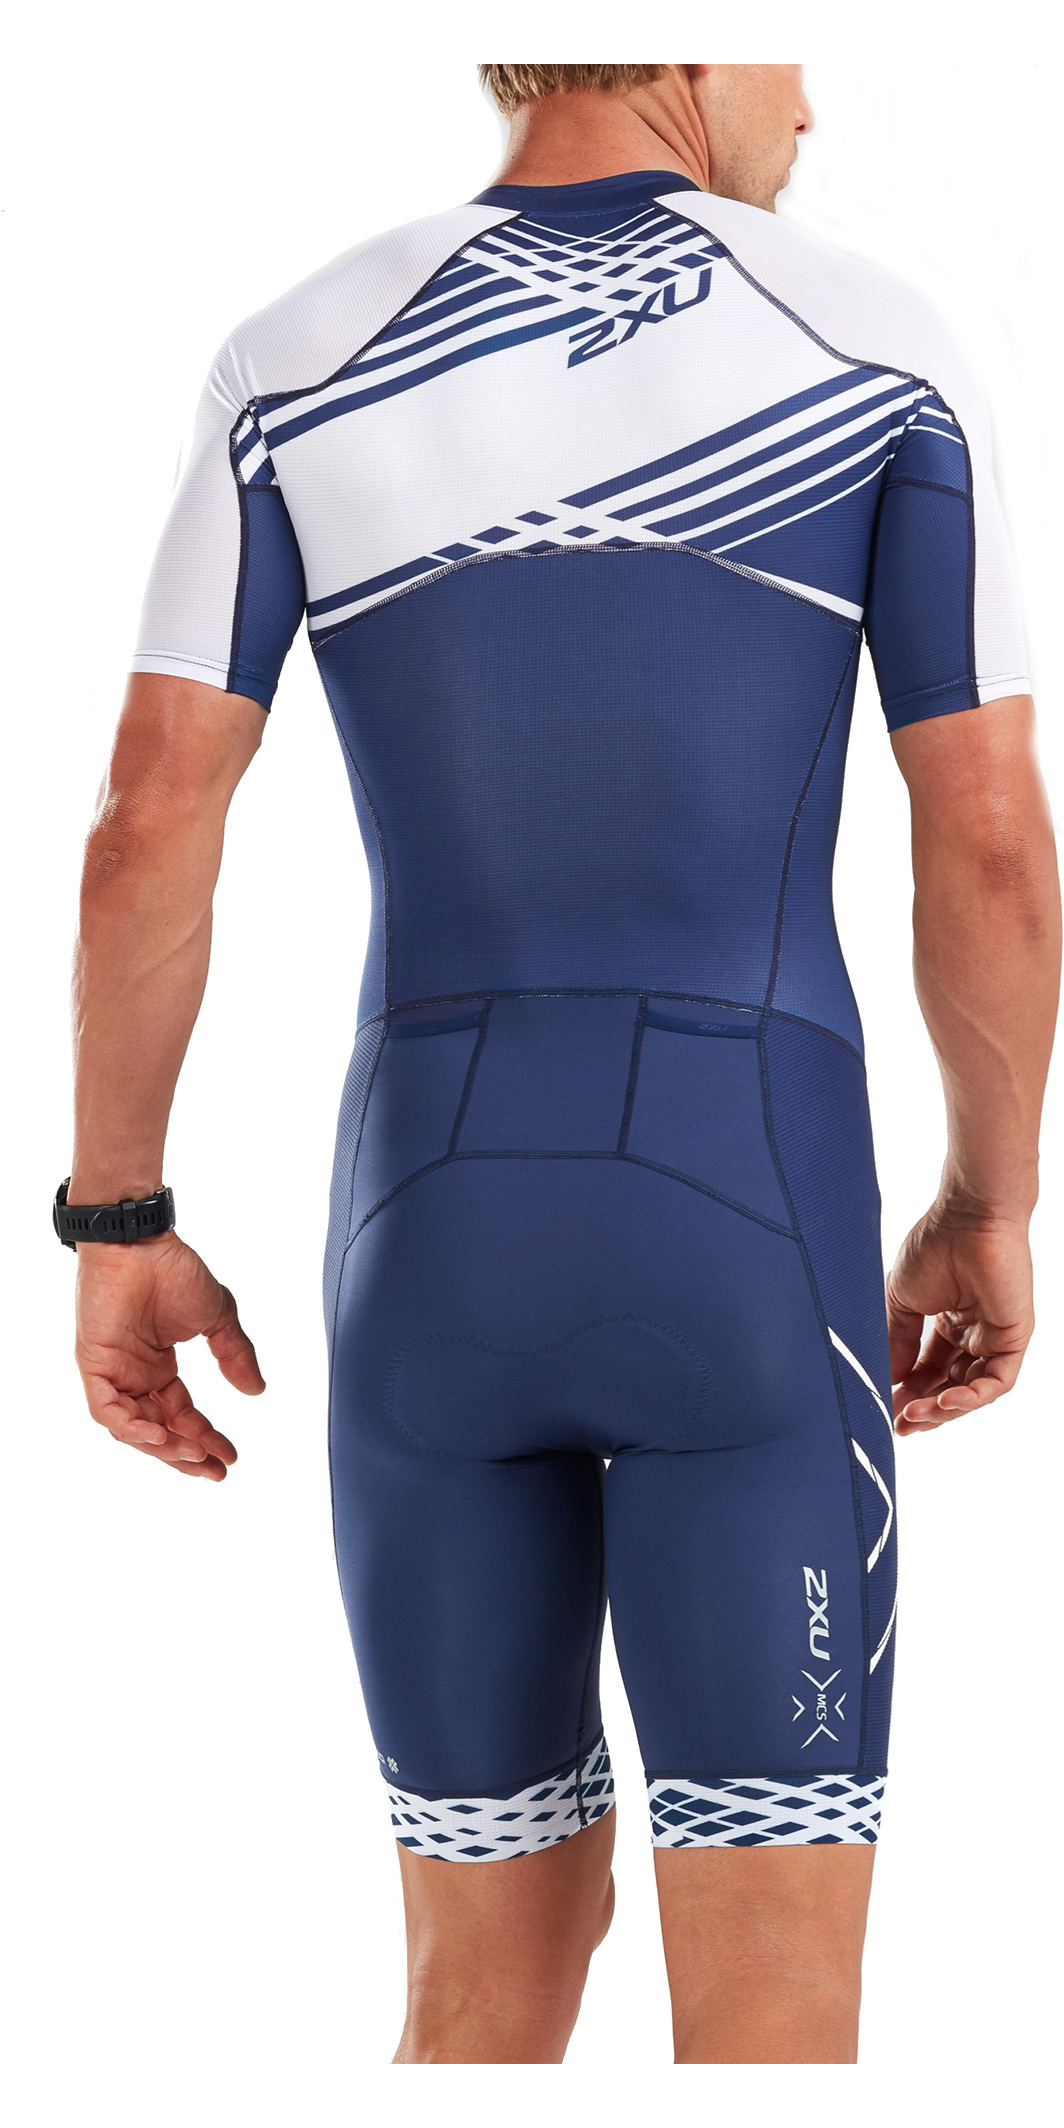 2019 2XU Mens Compression Full Zip Short Sleeve Trisuit Navy / White Line MT5516d